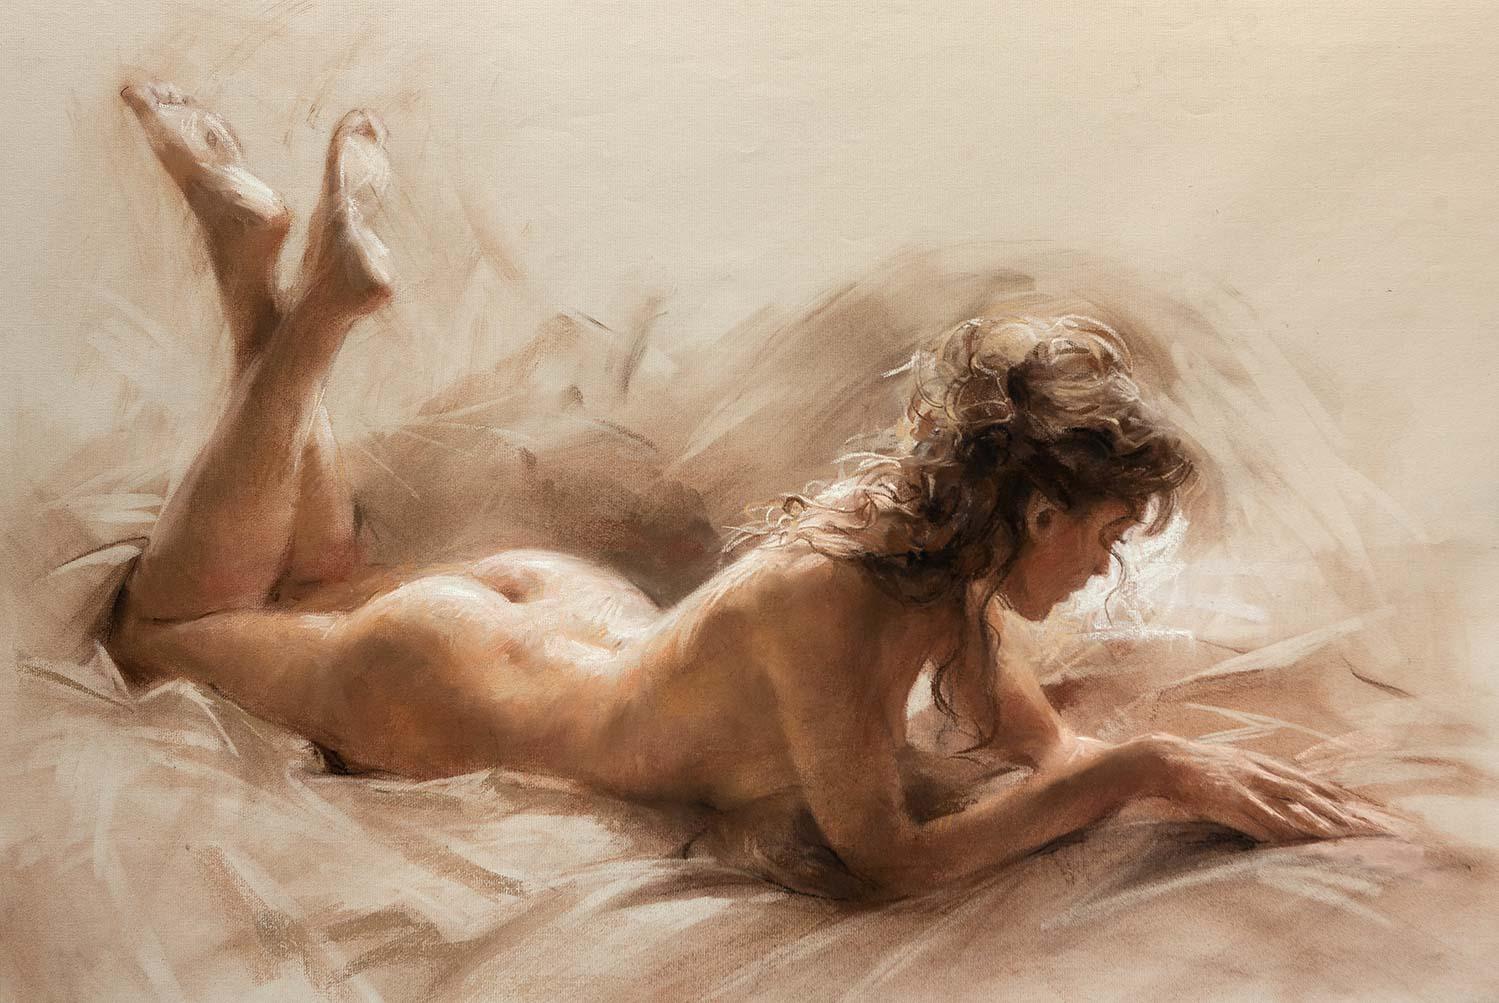 Serenity, Vicente Romero